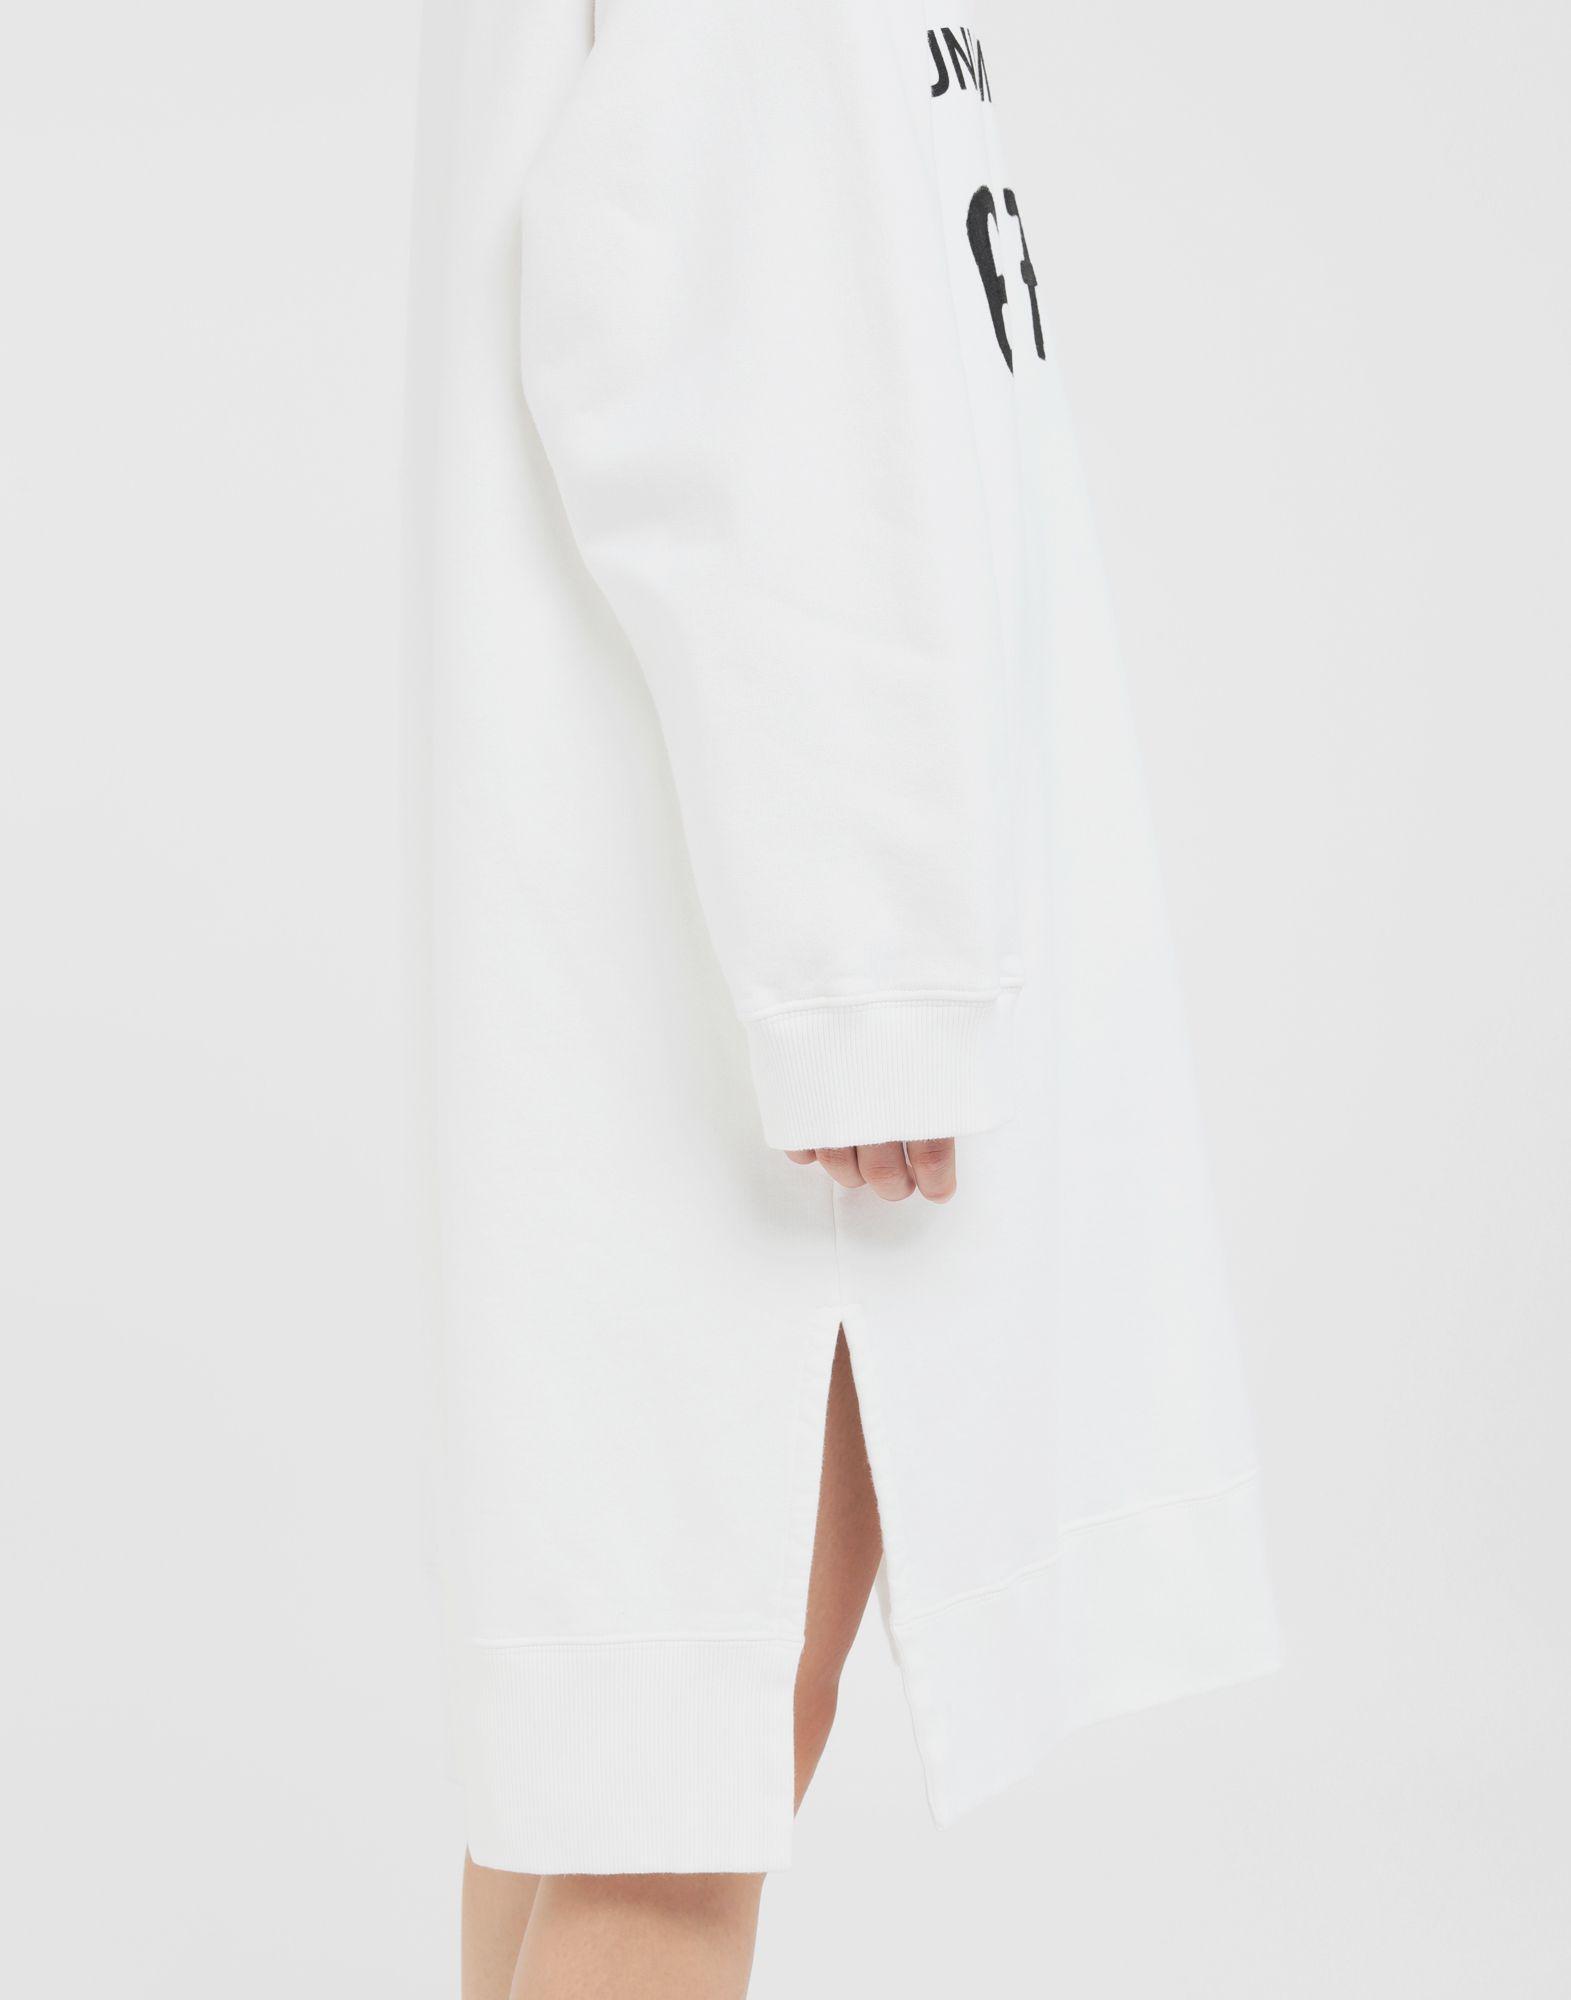 MM6 MAISON MARGIELA Unlimited Edition dress Dress Woman b